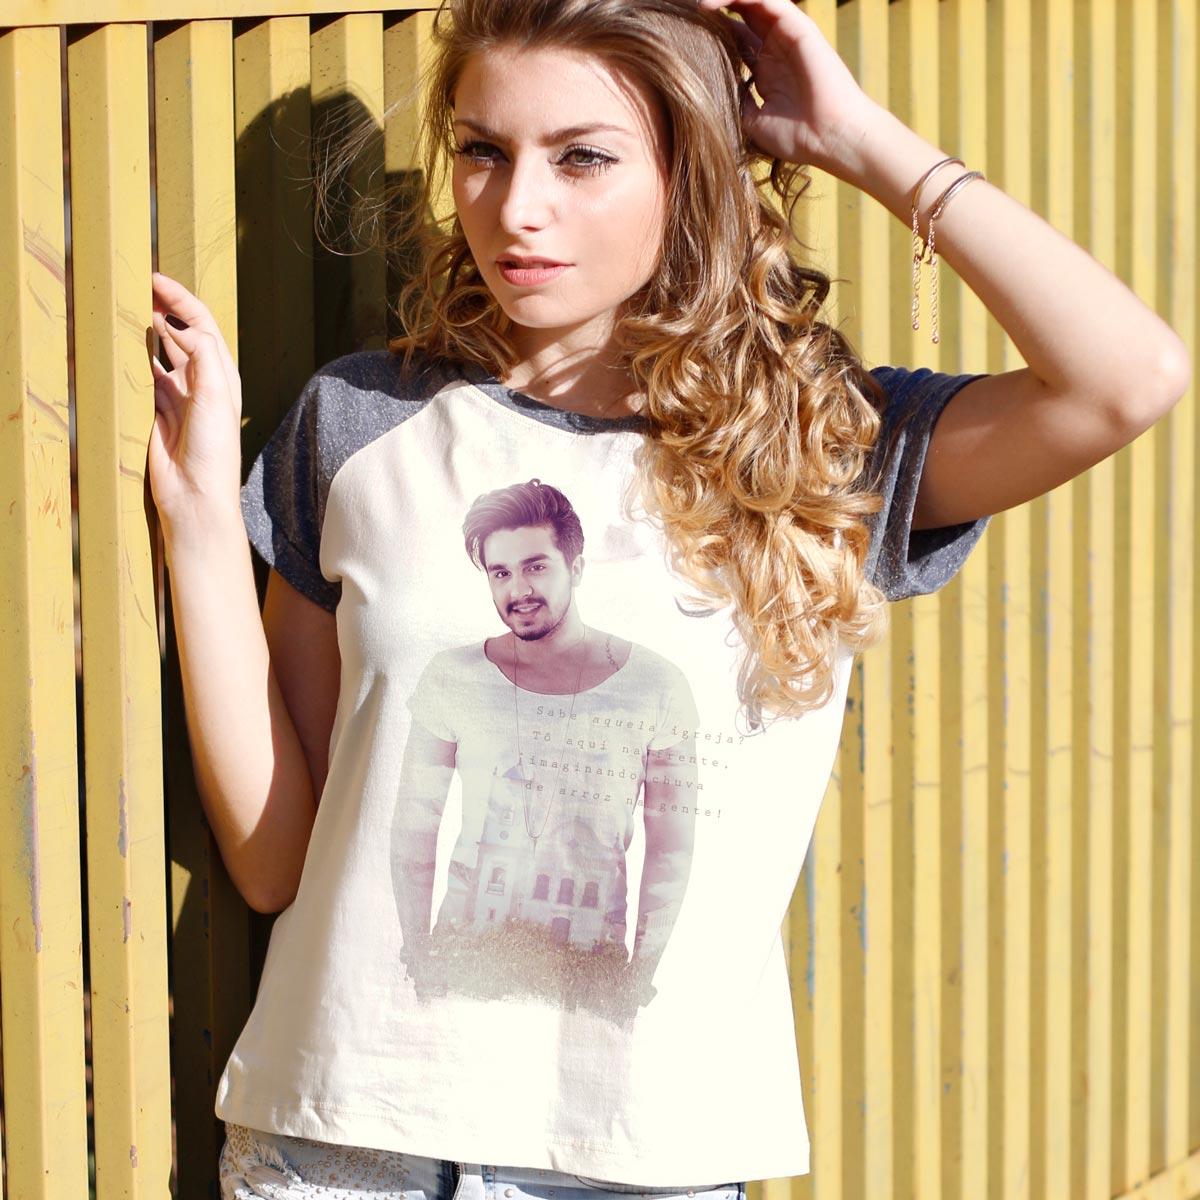 Camiseta Raglan Feminina Luan Santana Chuva de Arroz Na Gente